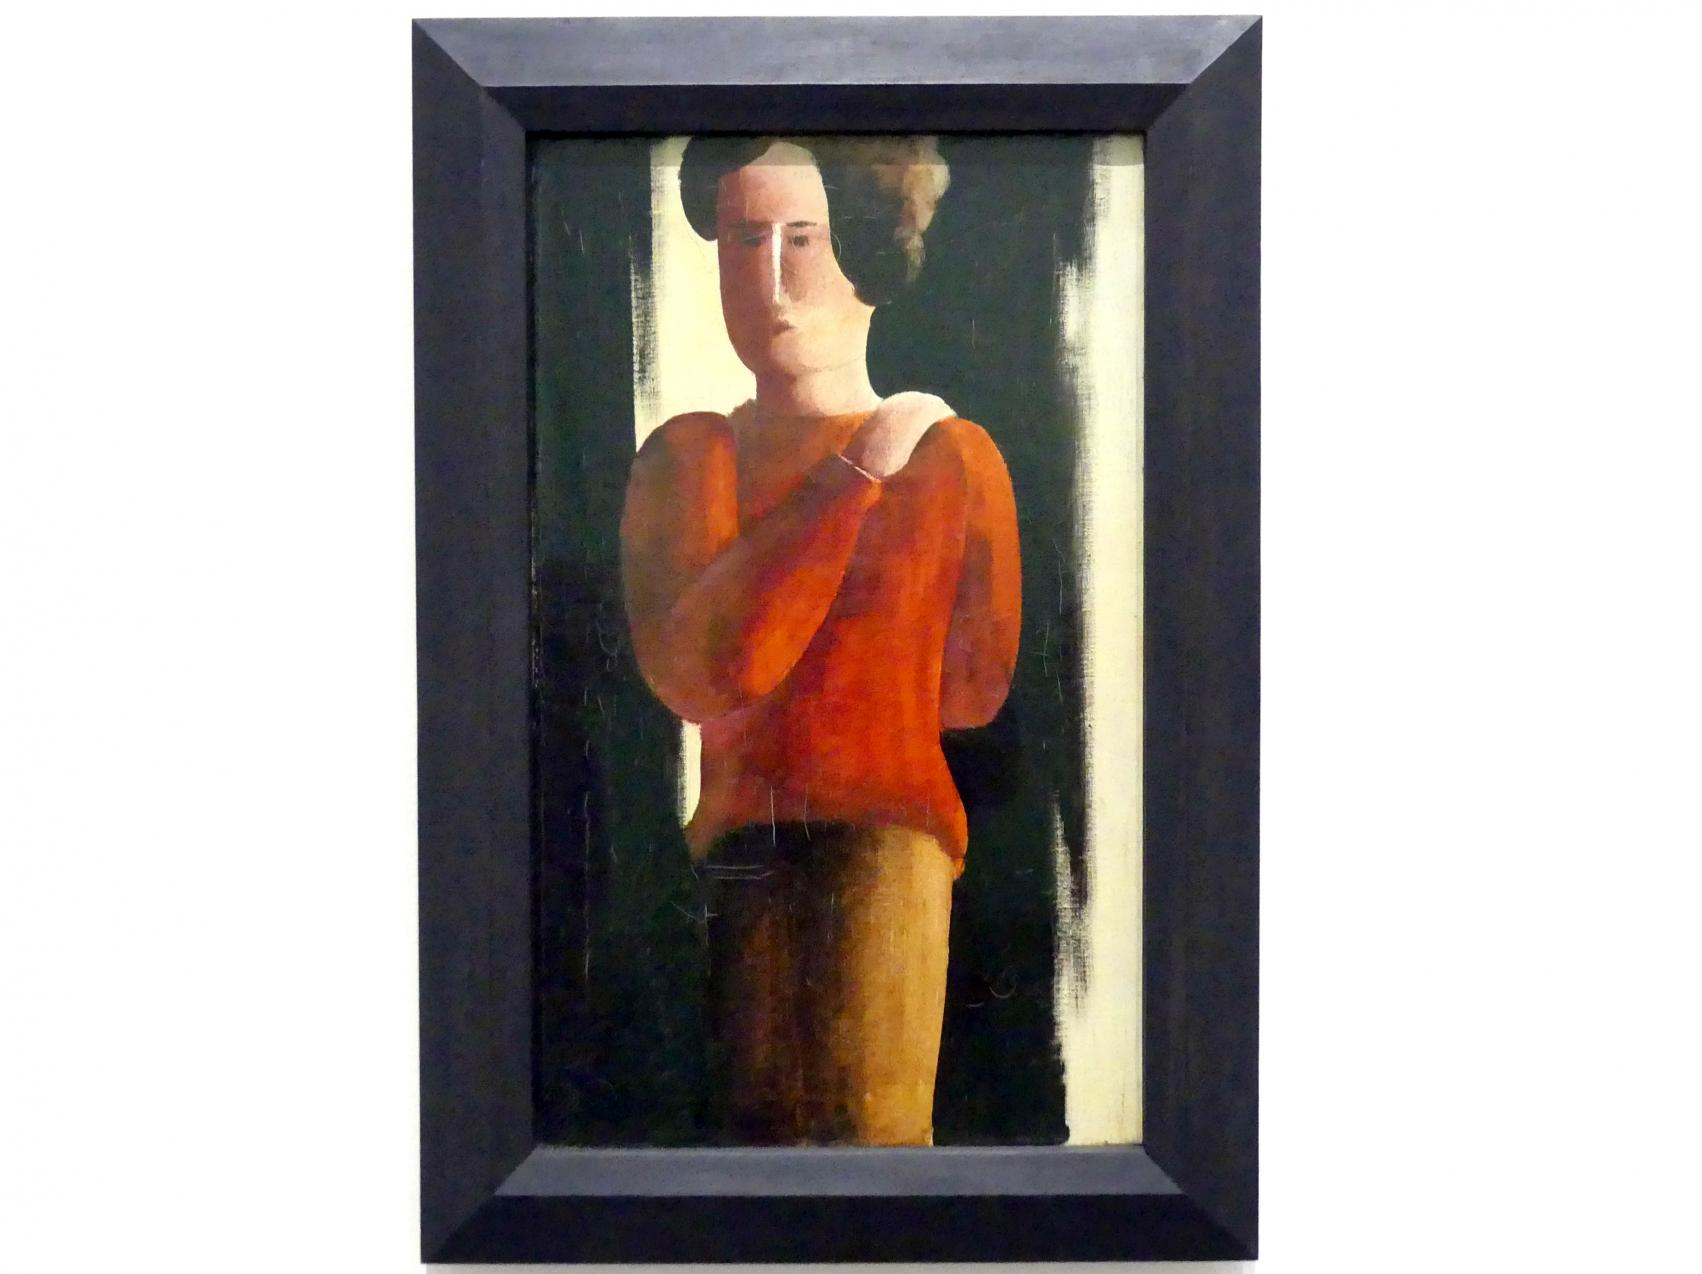 Oskar Schlemmer: Roter Junge, 1928